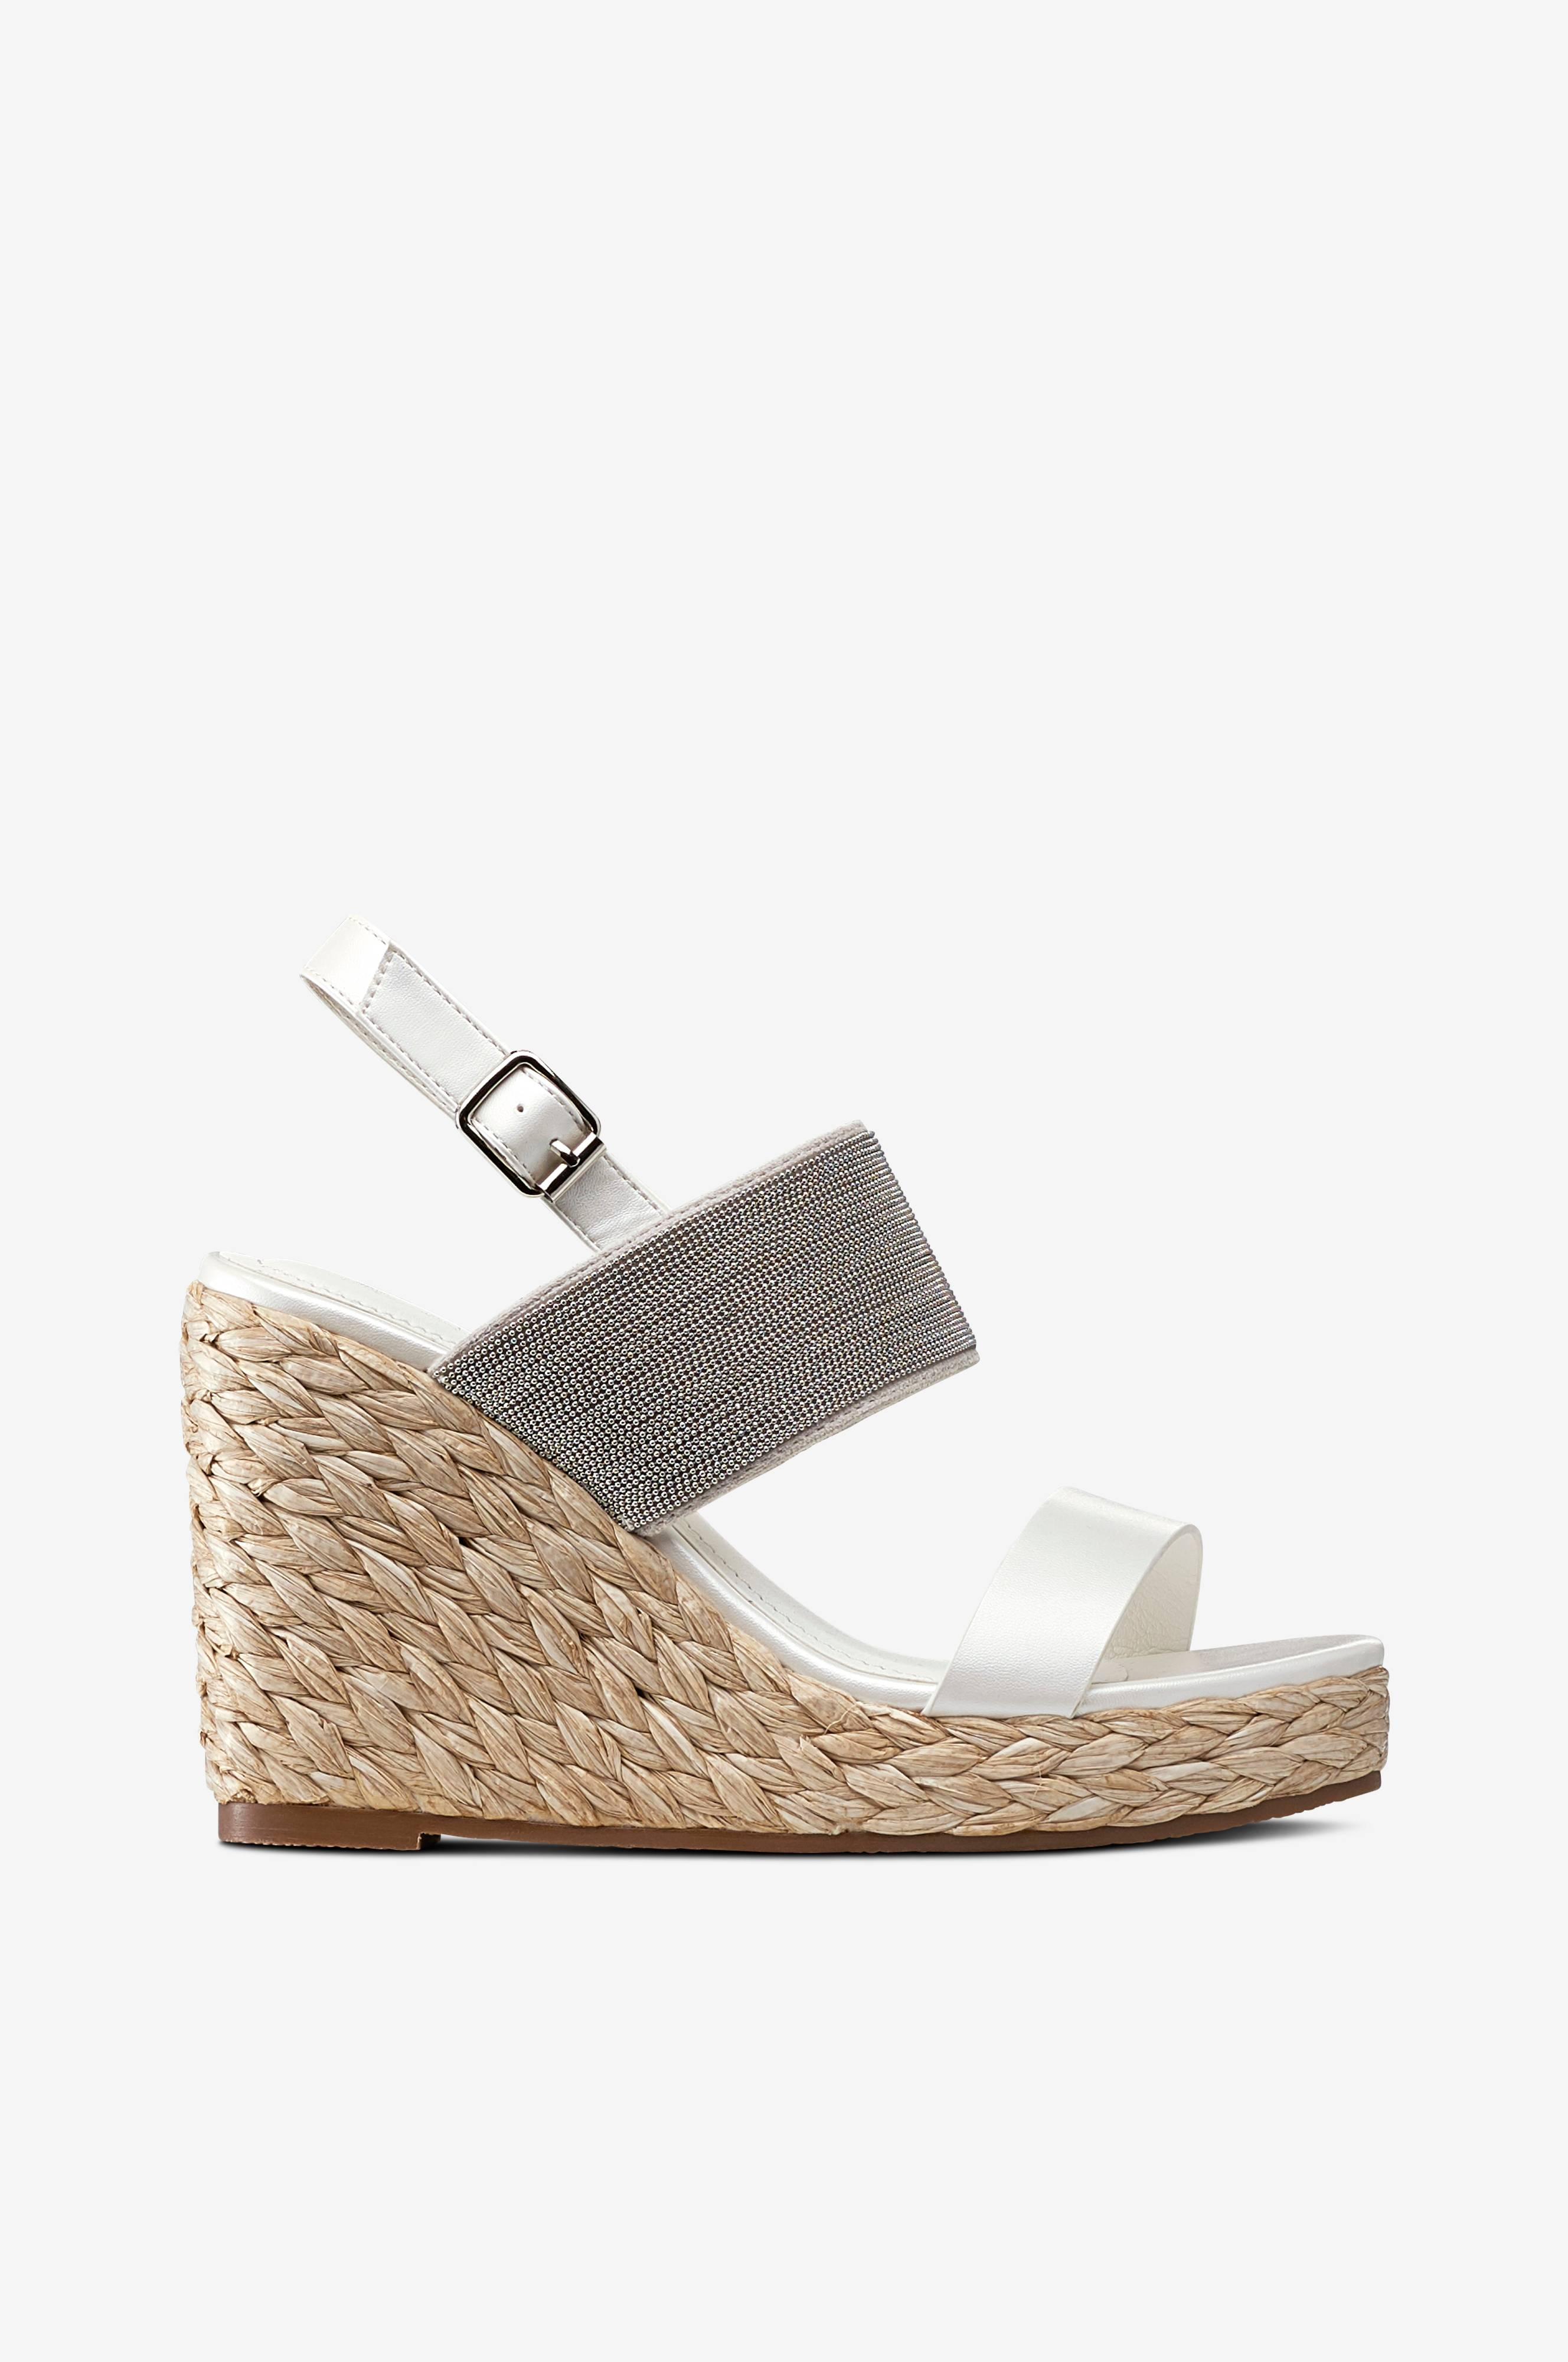 d7631e1b48c8 Ellos Shoes Sandal Marrakesh - Hvid - Dame - Ellos.dk